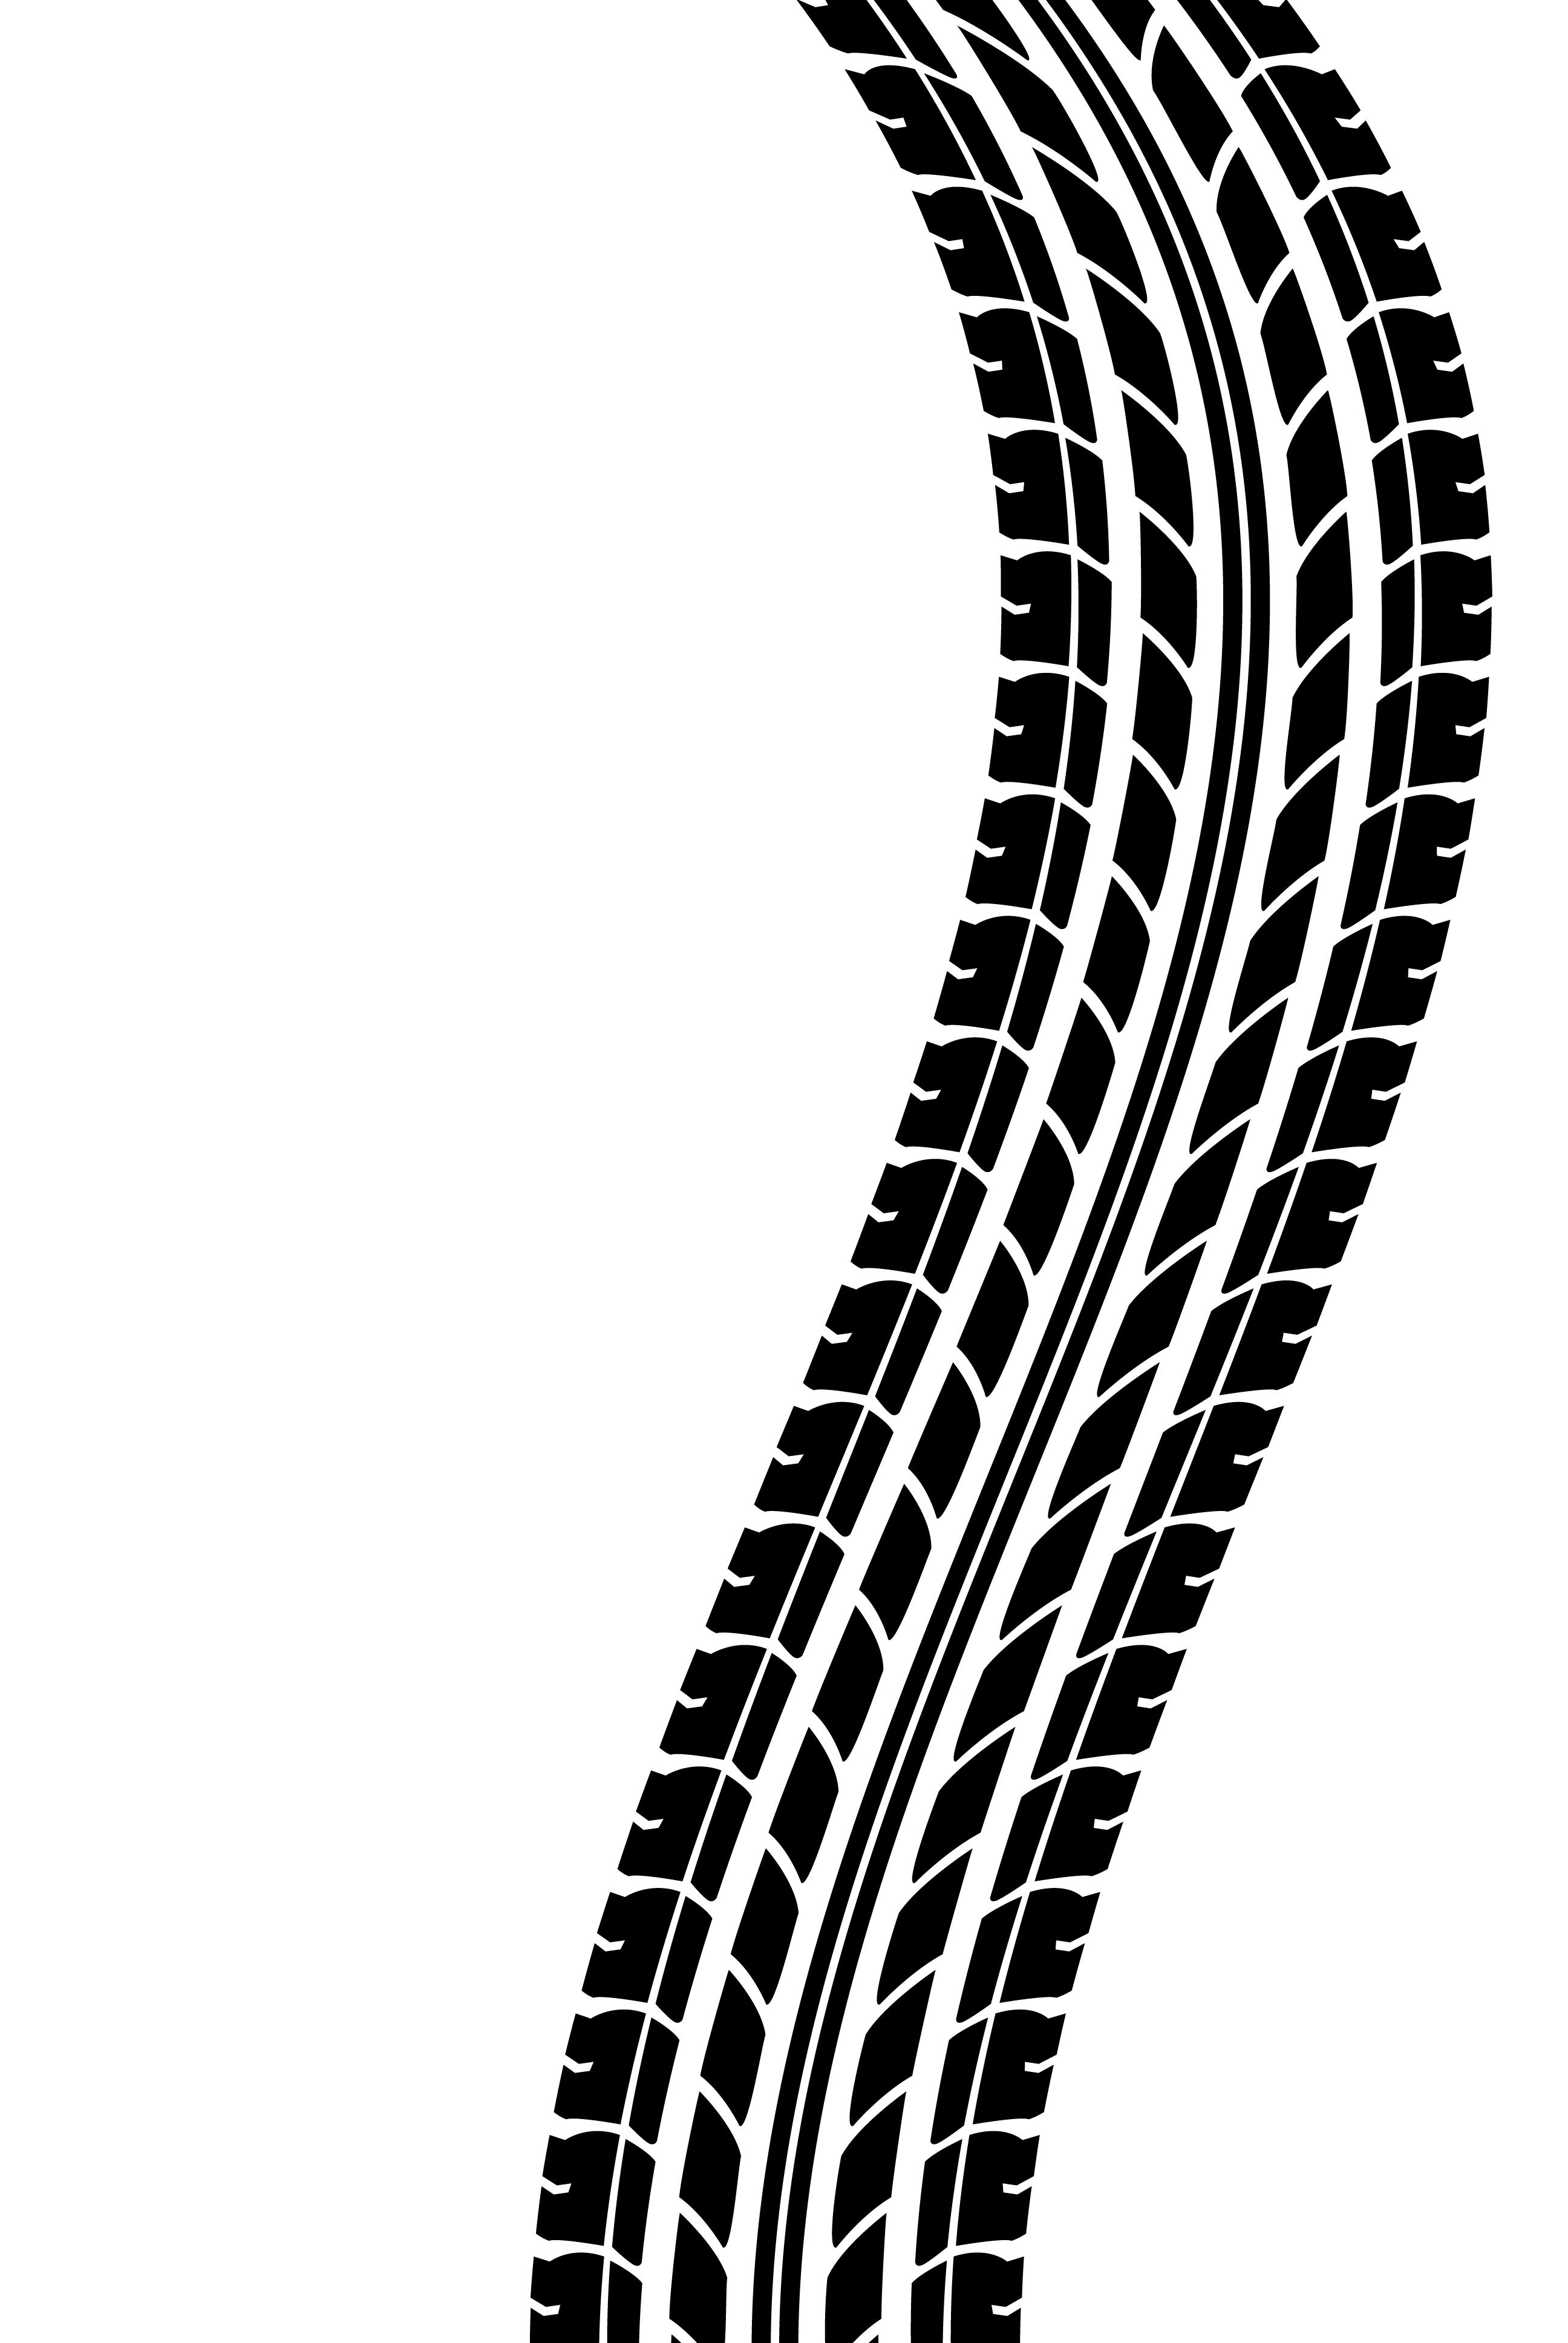 2592x3872 Tire Tracks Clip Art